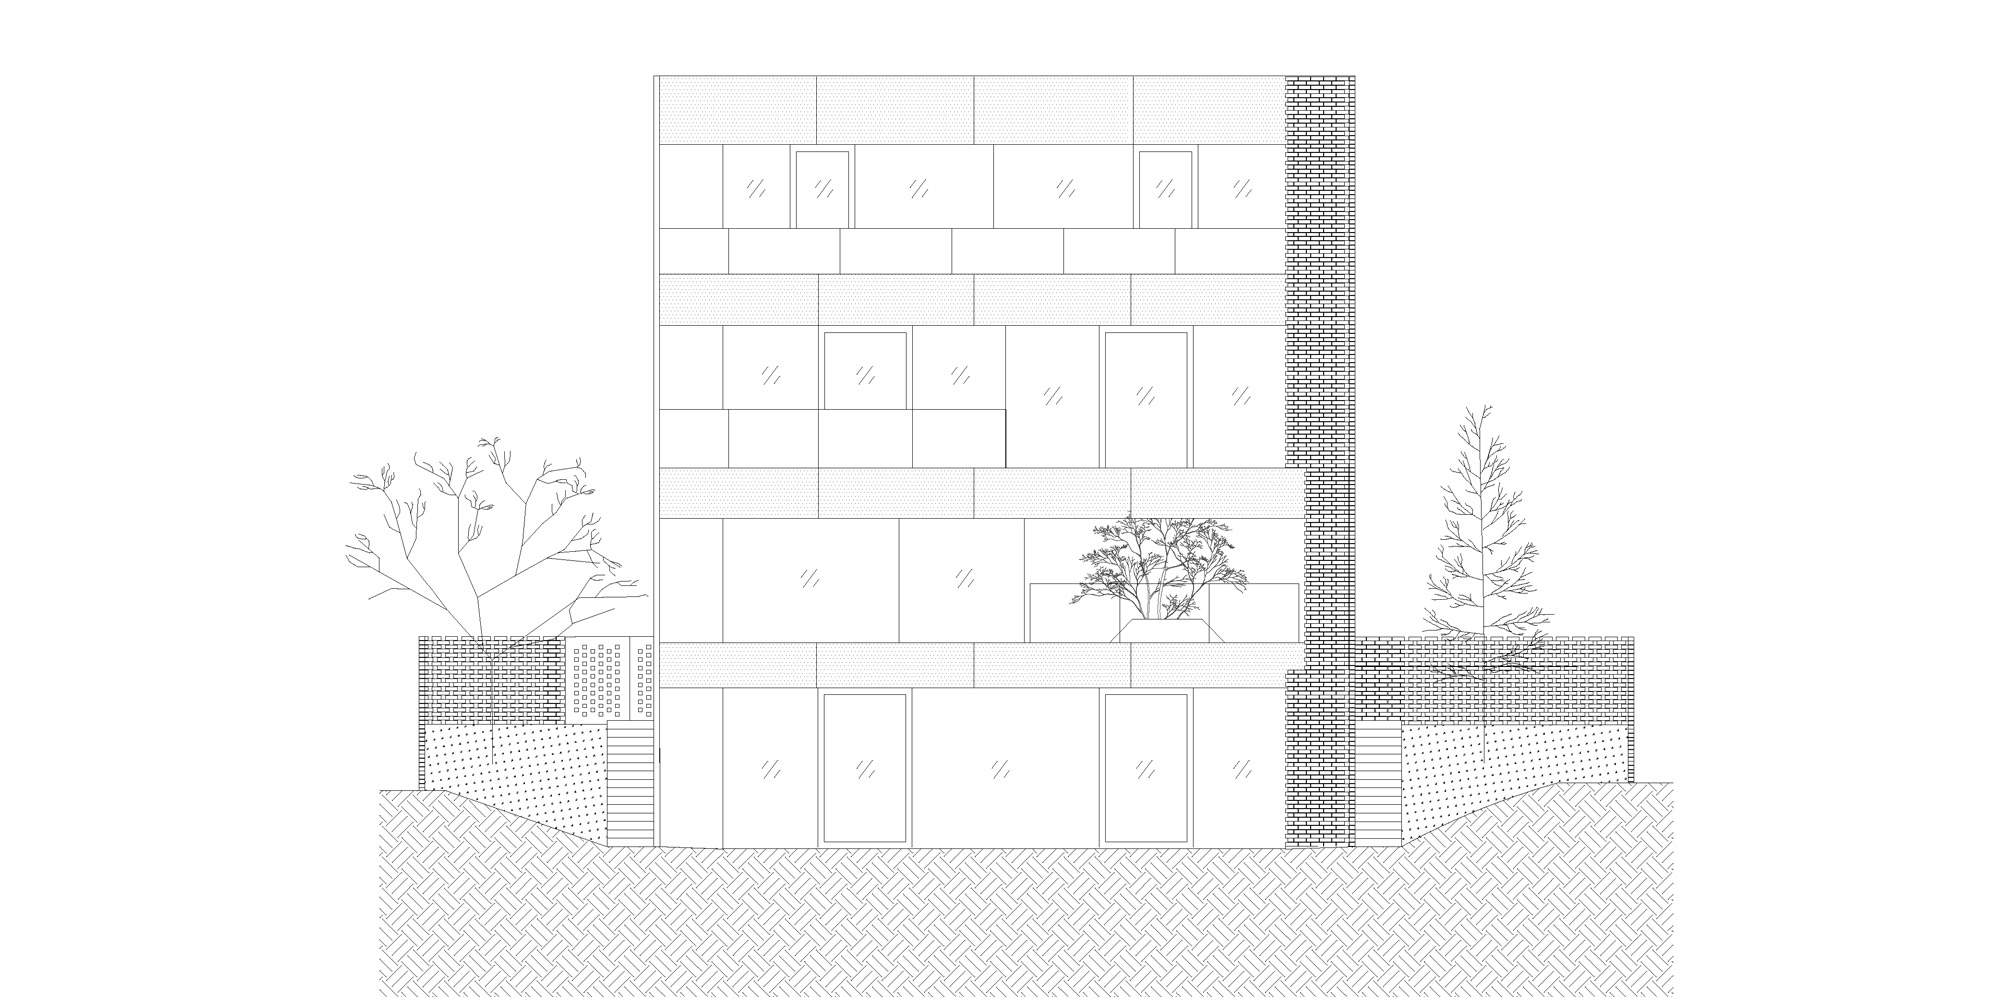 West elevation © OFIS architekti